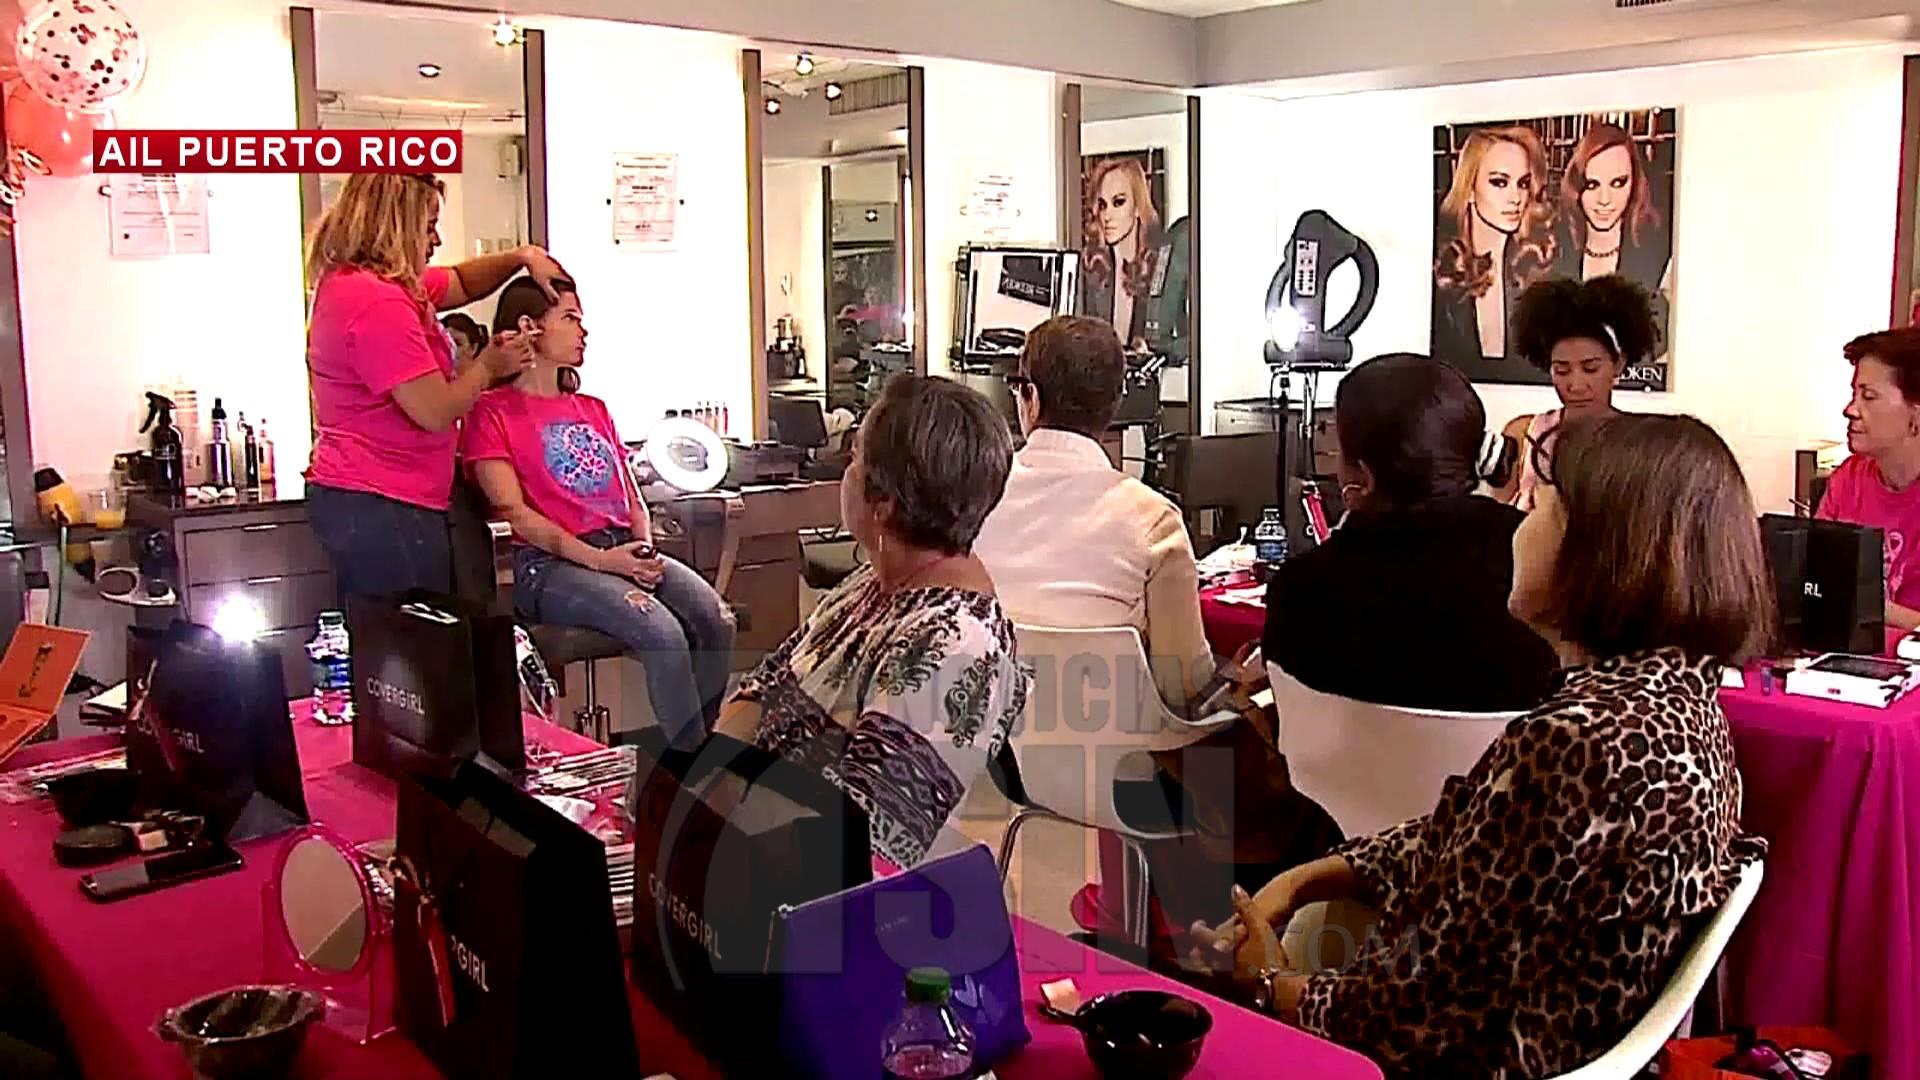 Taller de maquillaje para pacientes con cáncer de mama